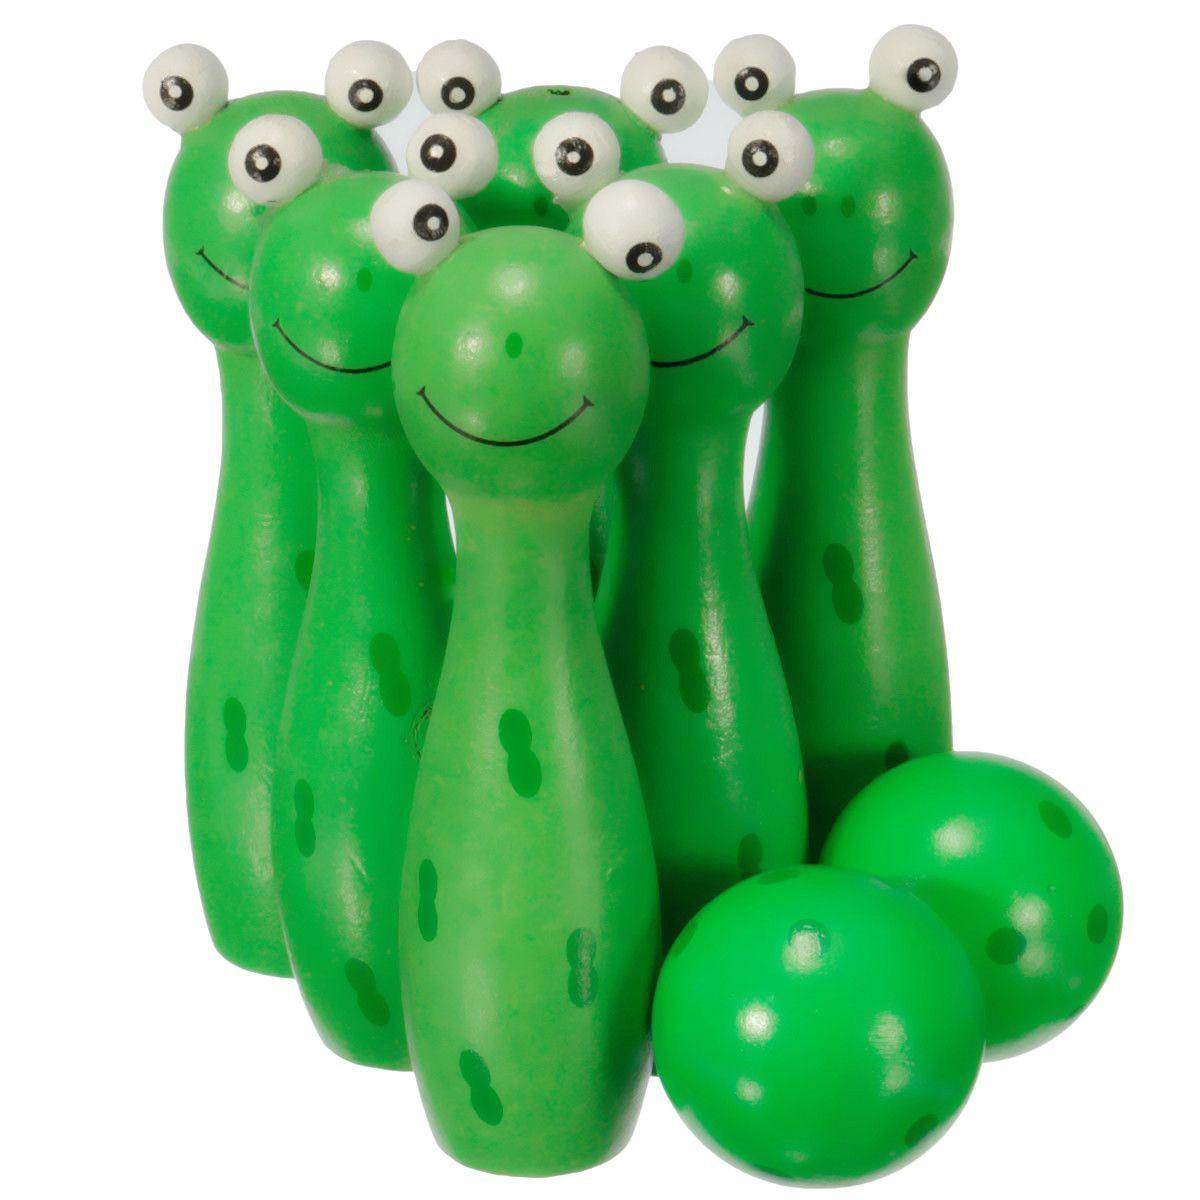 Wooden Bowling Ball Skittle Animal Shape Game For Kids Children Toy Green